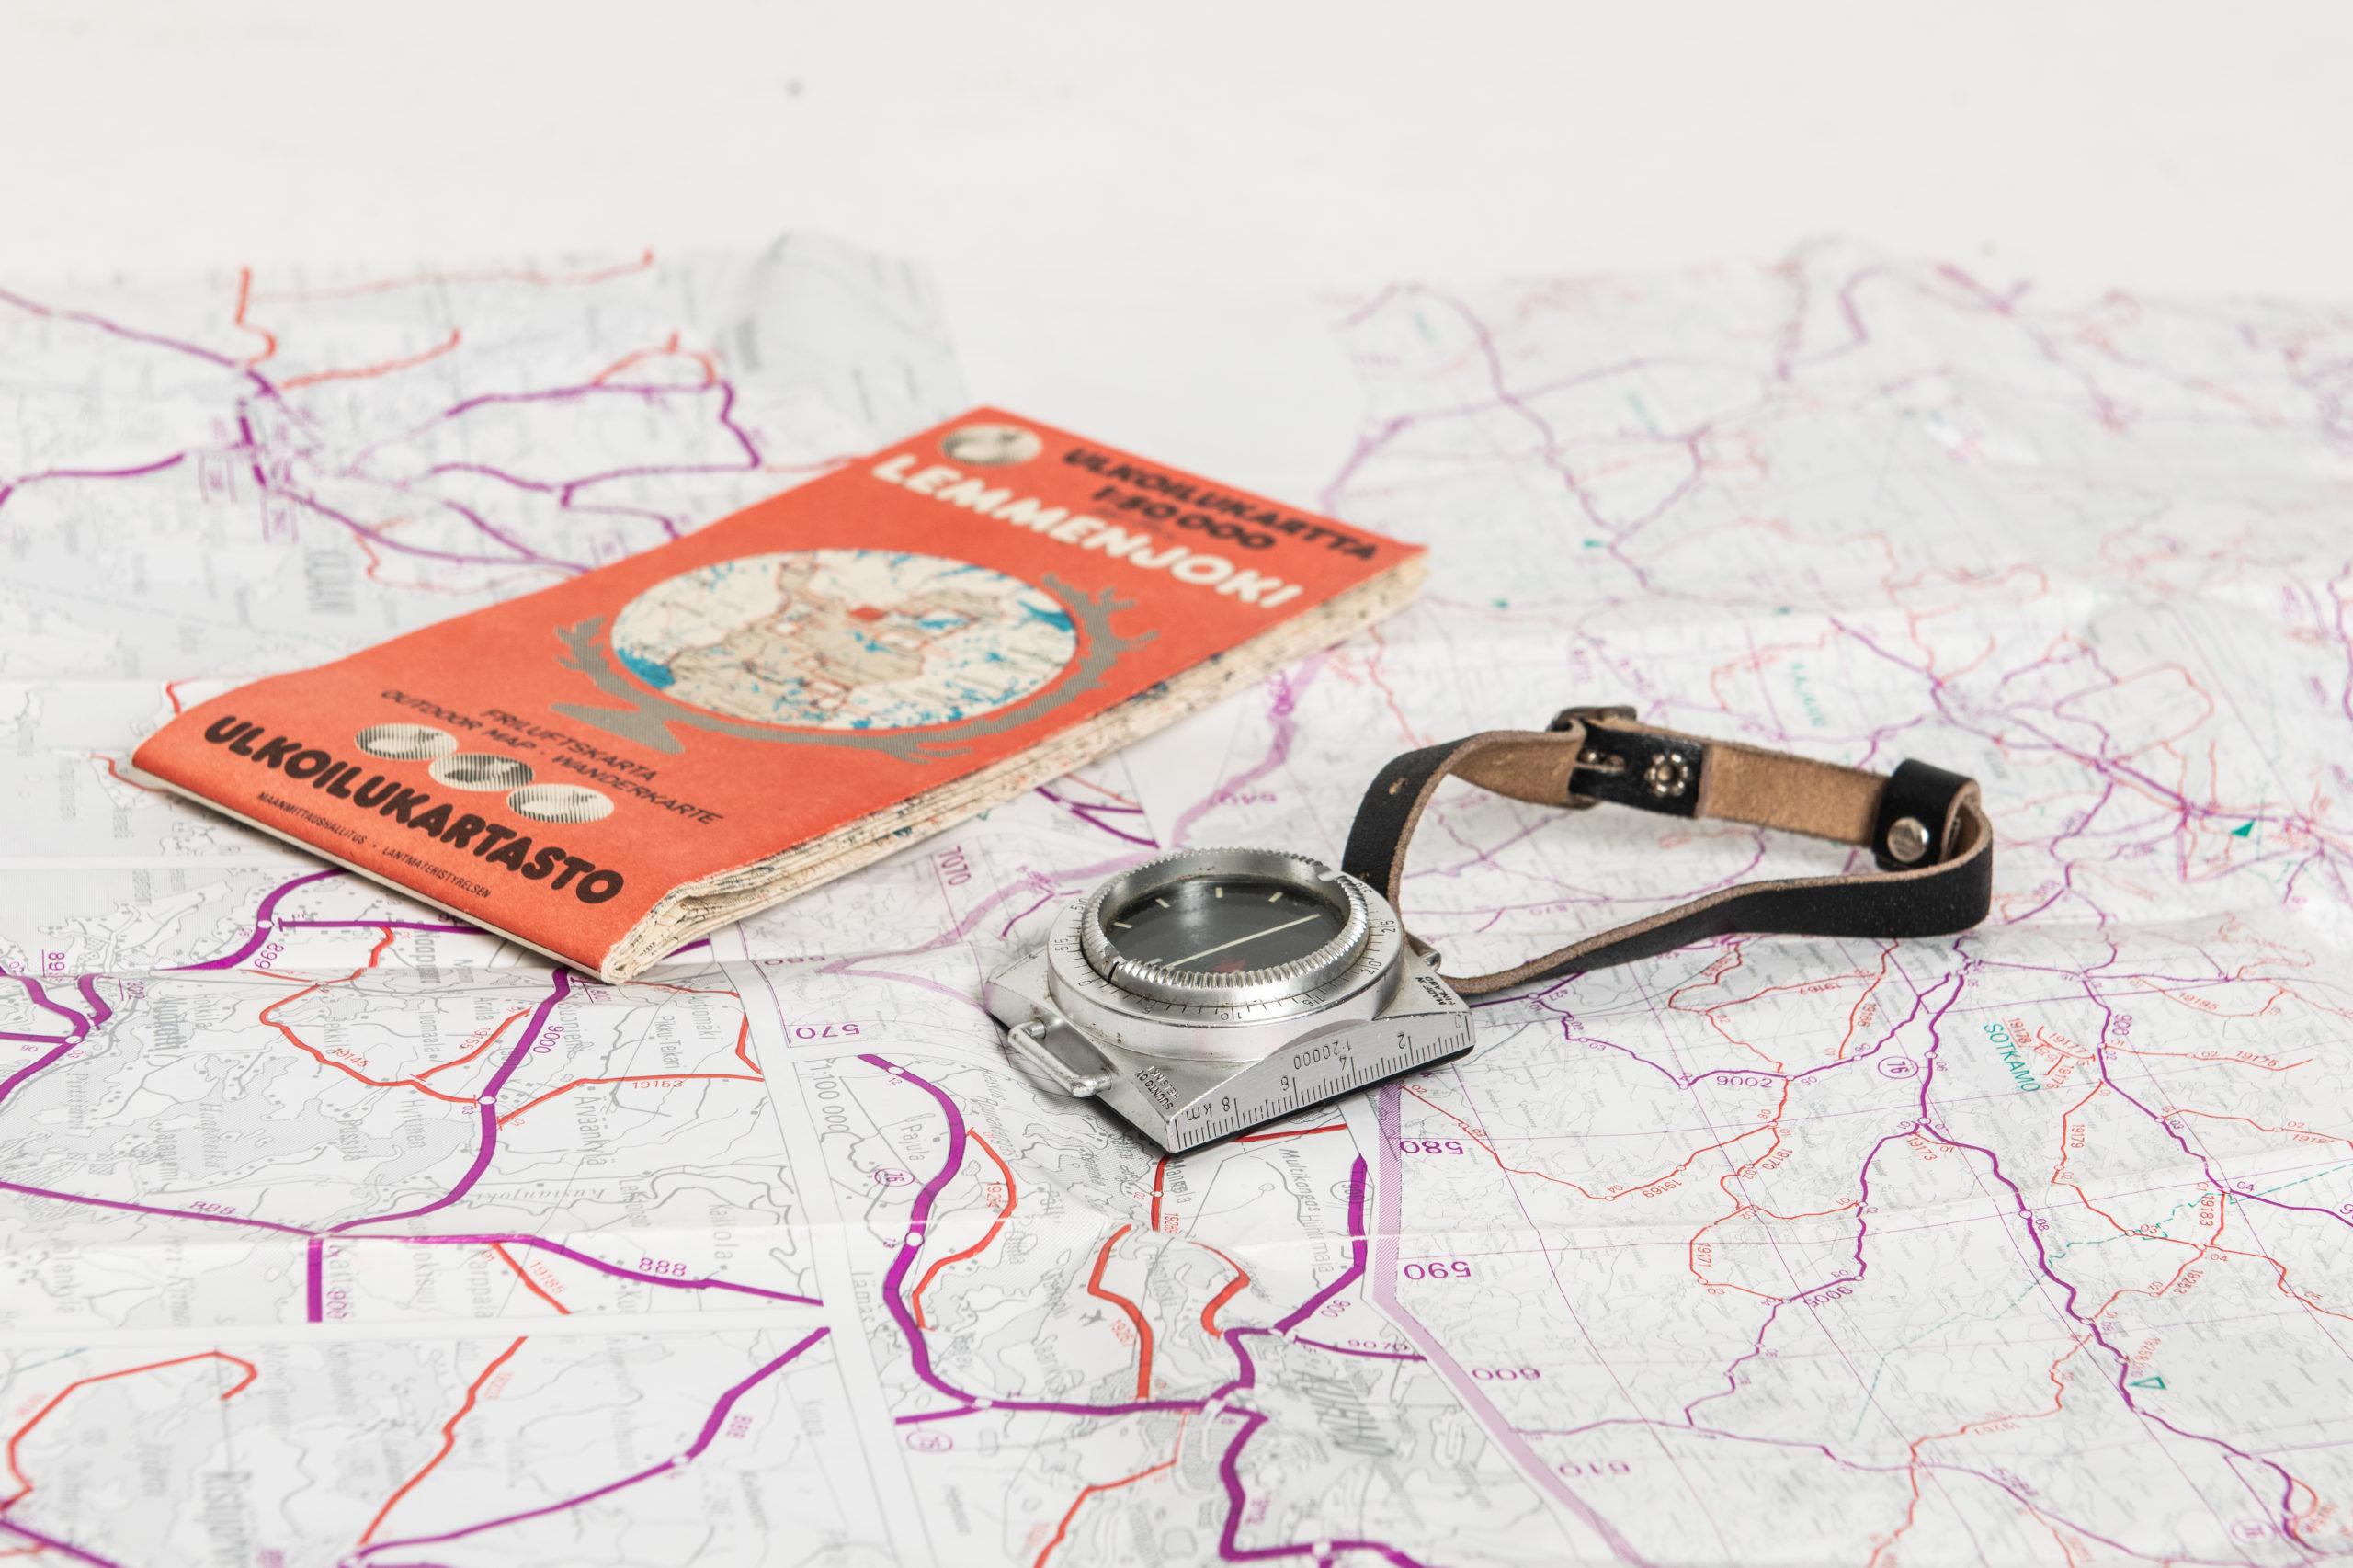 Kartta ja kompassi